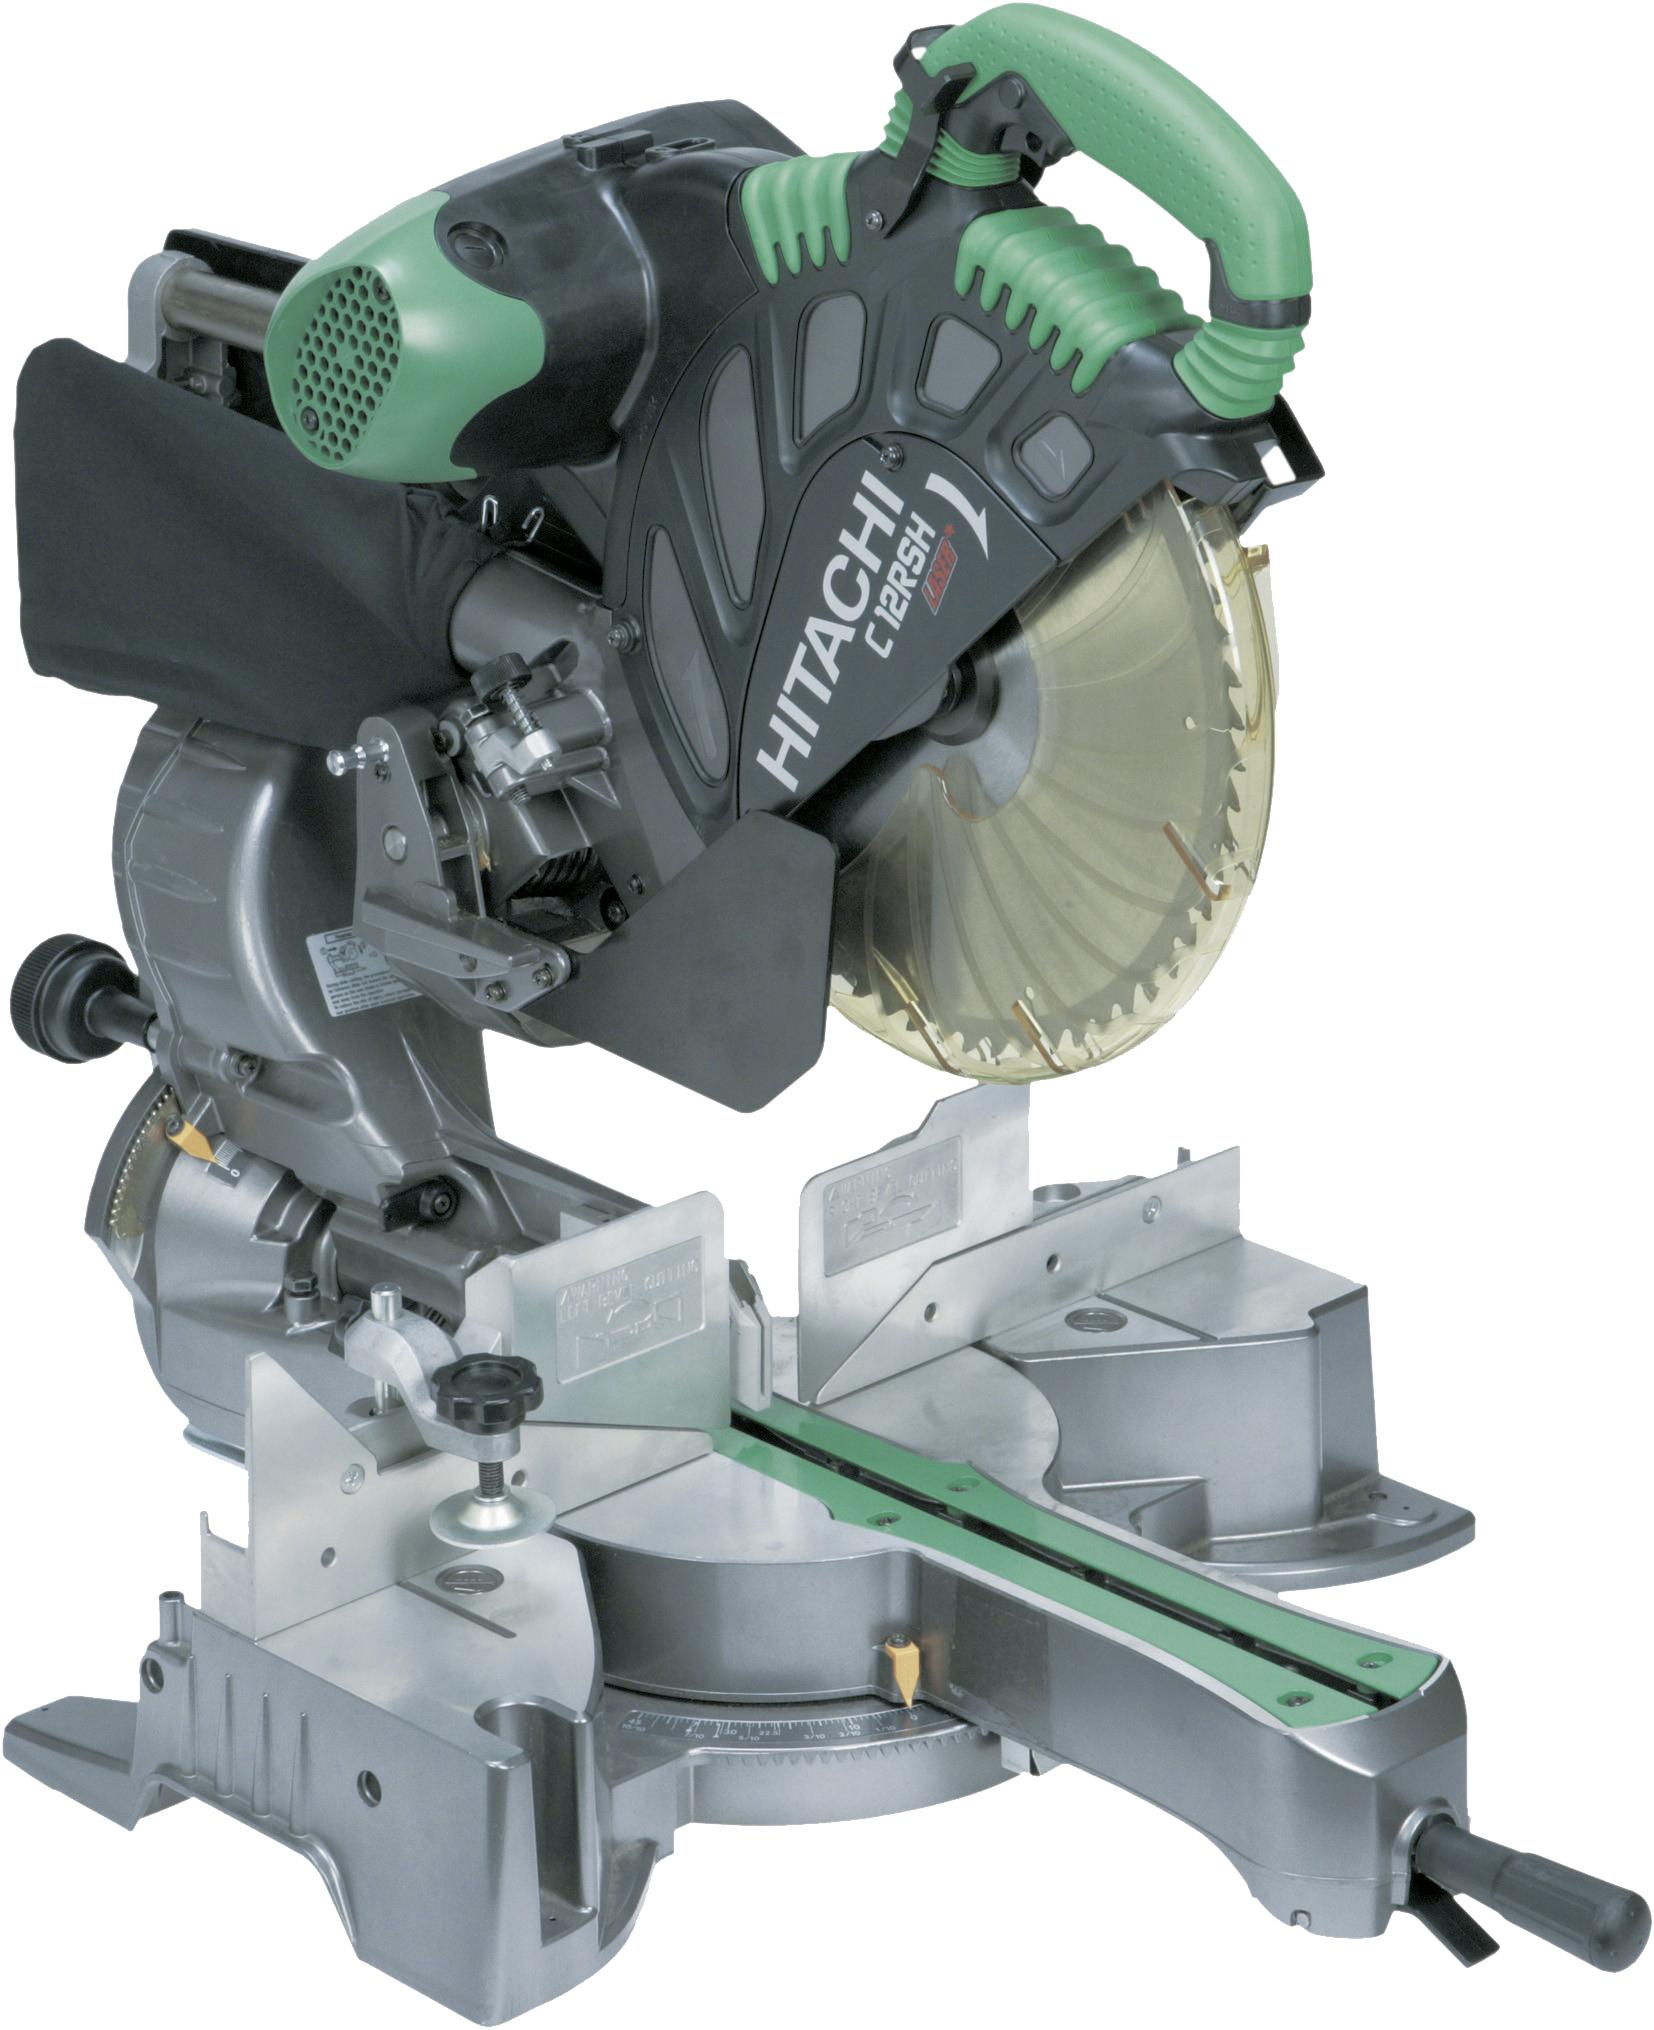 C12RSH-Ingletadora-telescopica-305mm-1520W